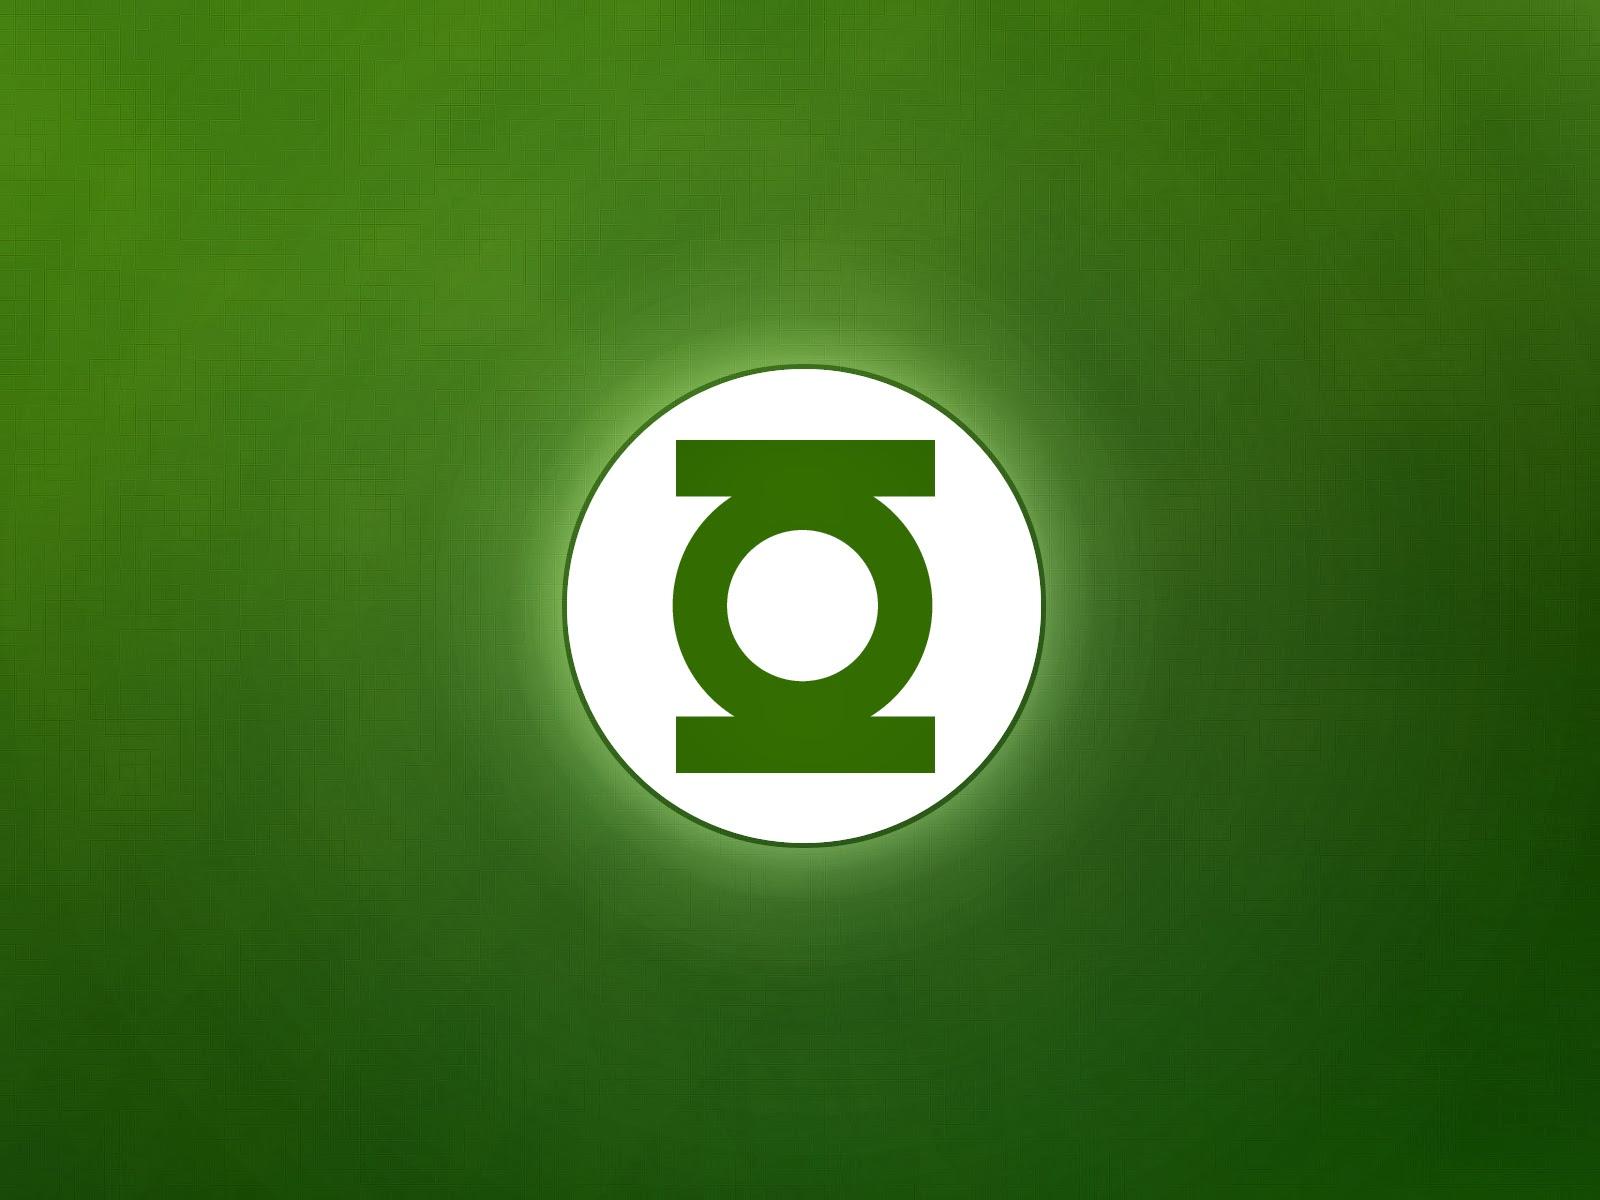 Símbolos de Linterna Verde.